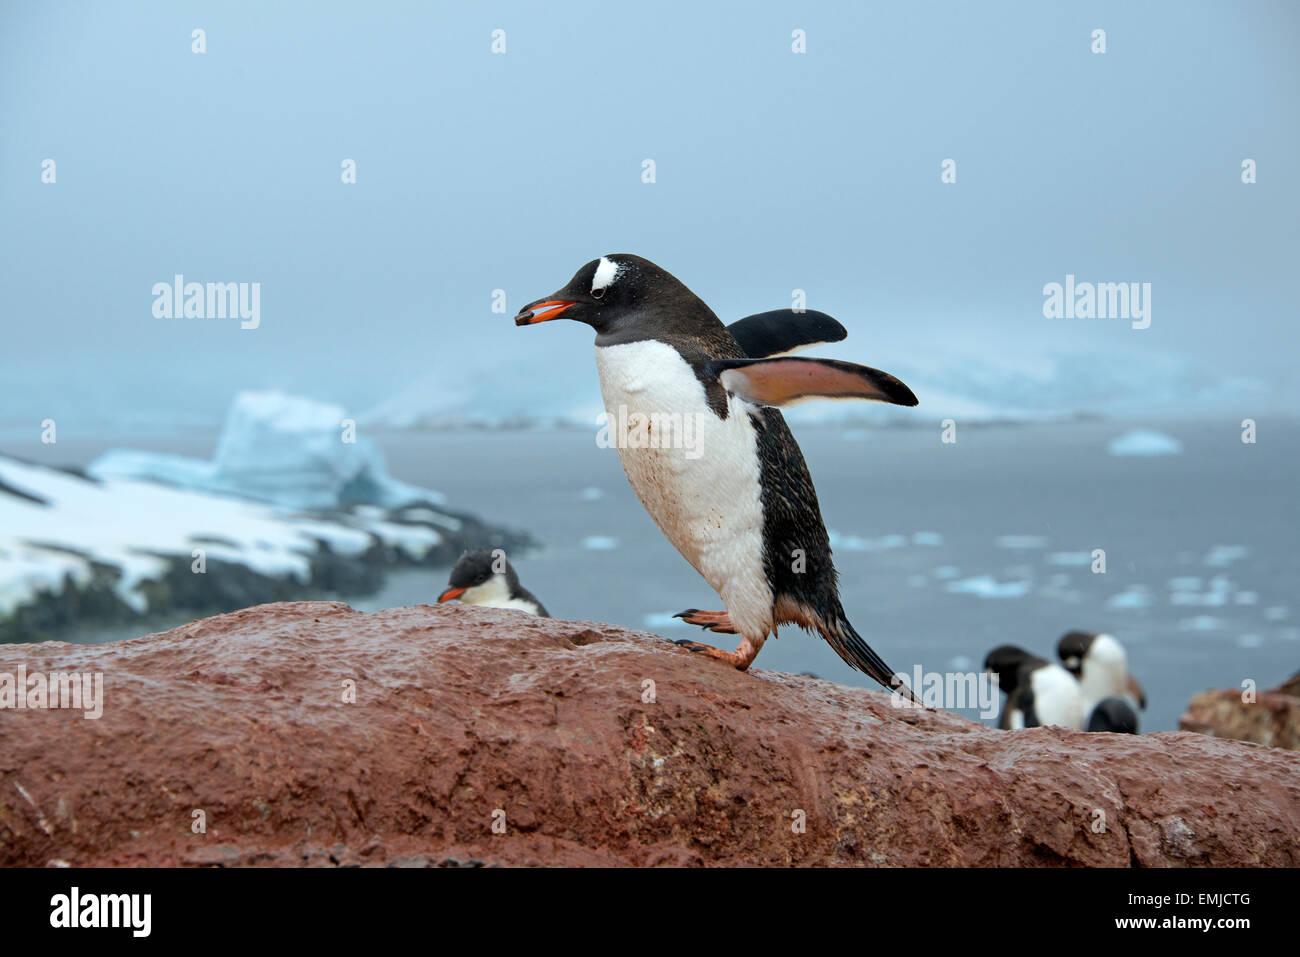 Gentoo Penguin carrying pebble in beak Peterman Island Antarctic Peninsular Antartica - Stock Image